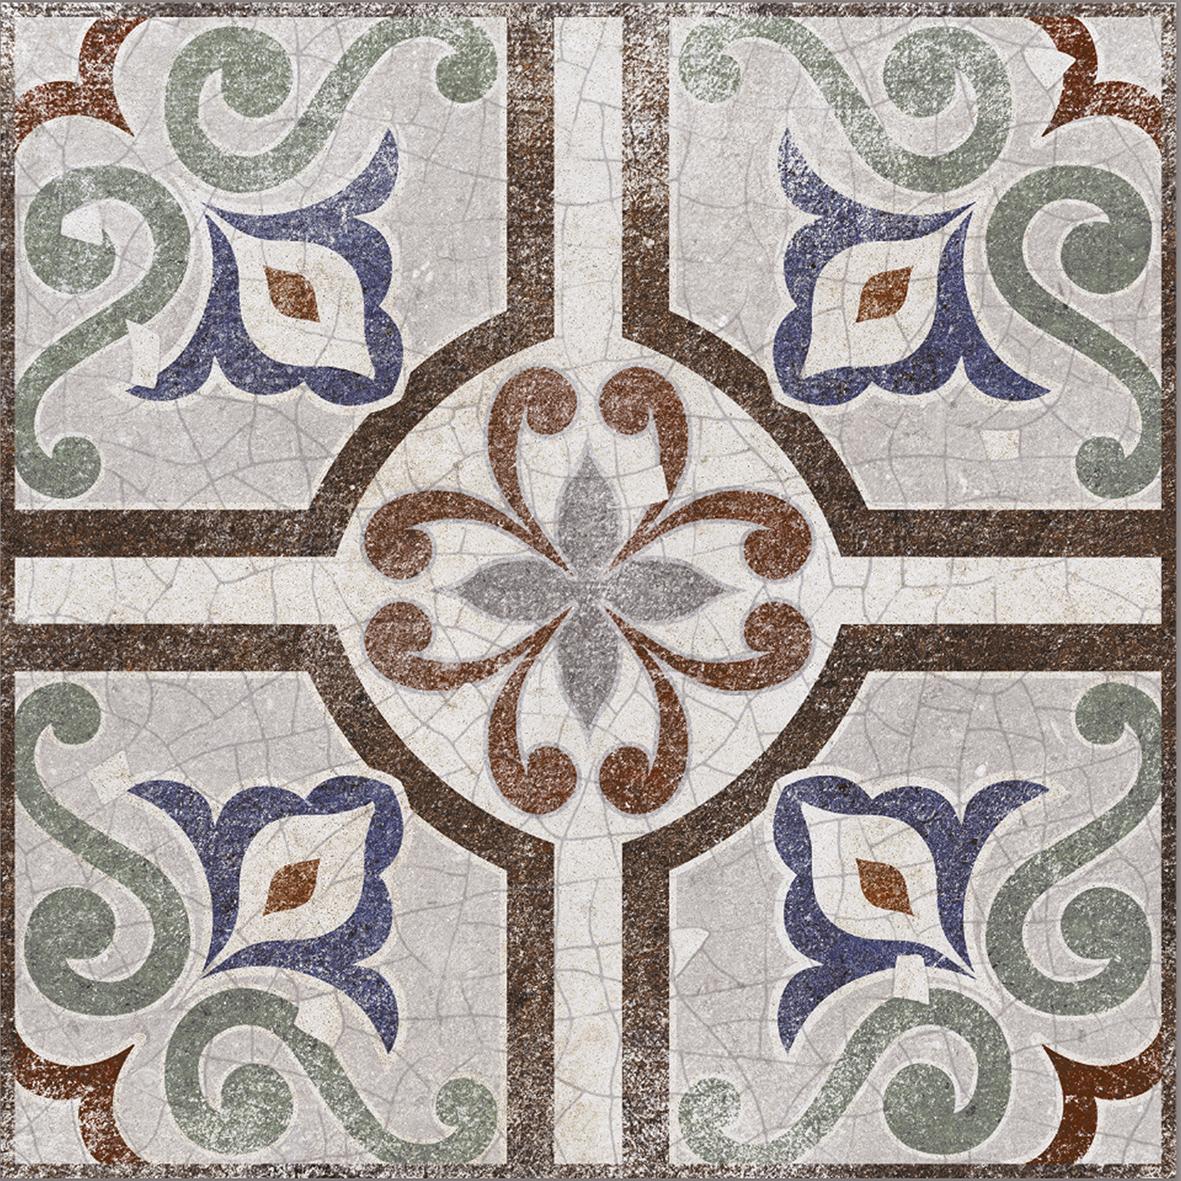 Emilia multi Плитка настенная 01 20х20 плитка настенная капри 20х20 см 1 04 м2 цвет зелёный